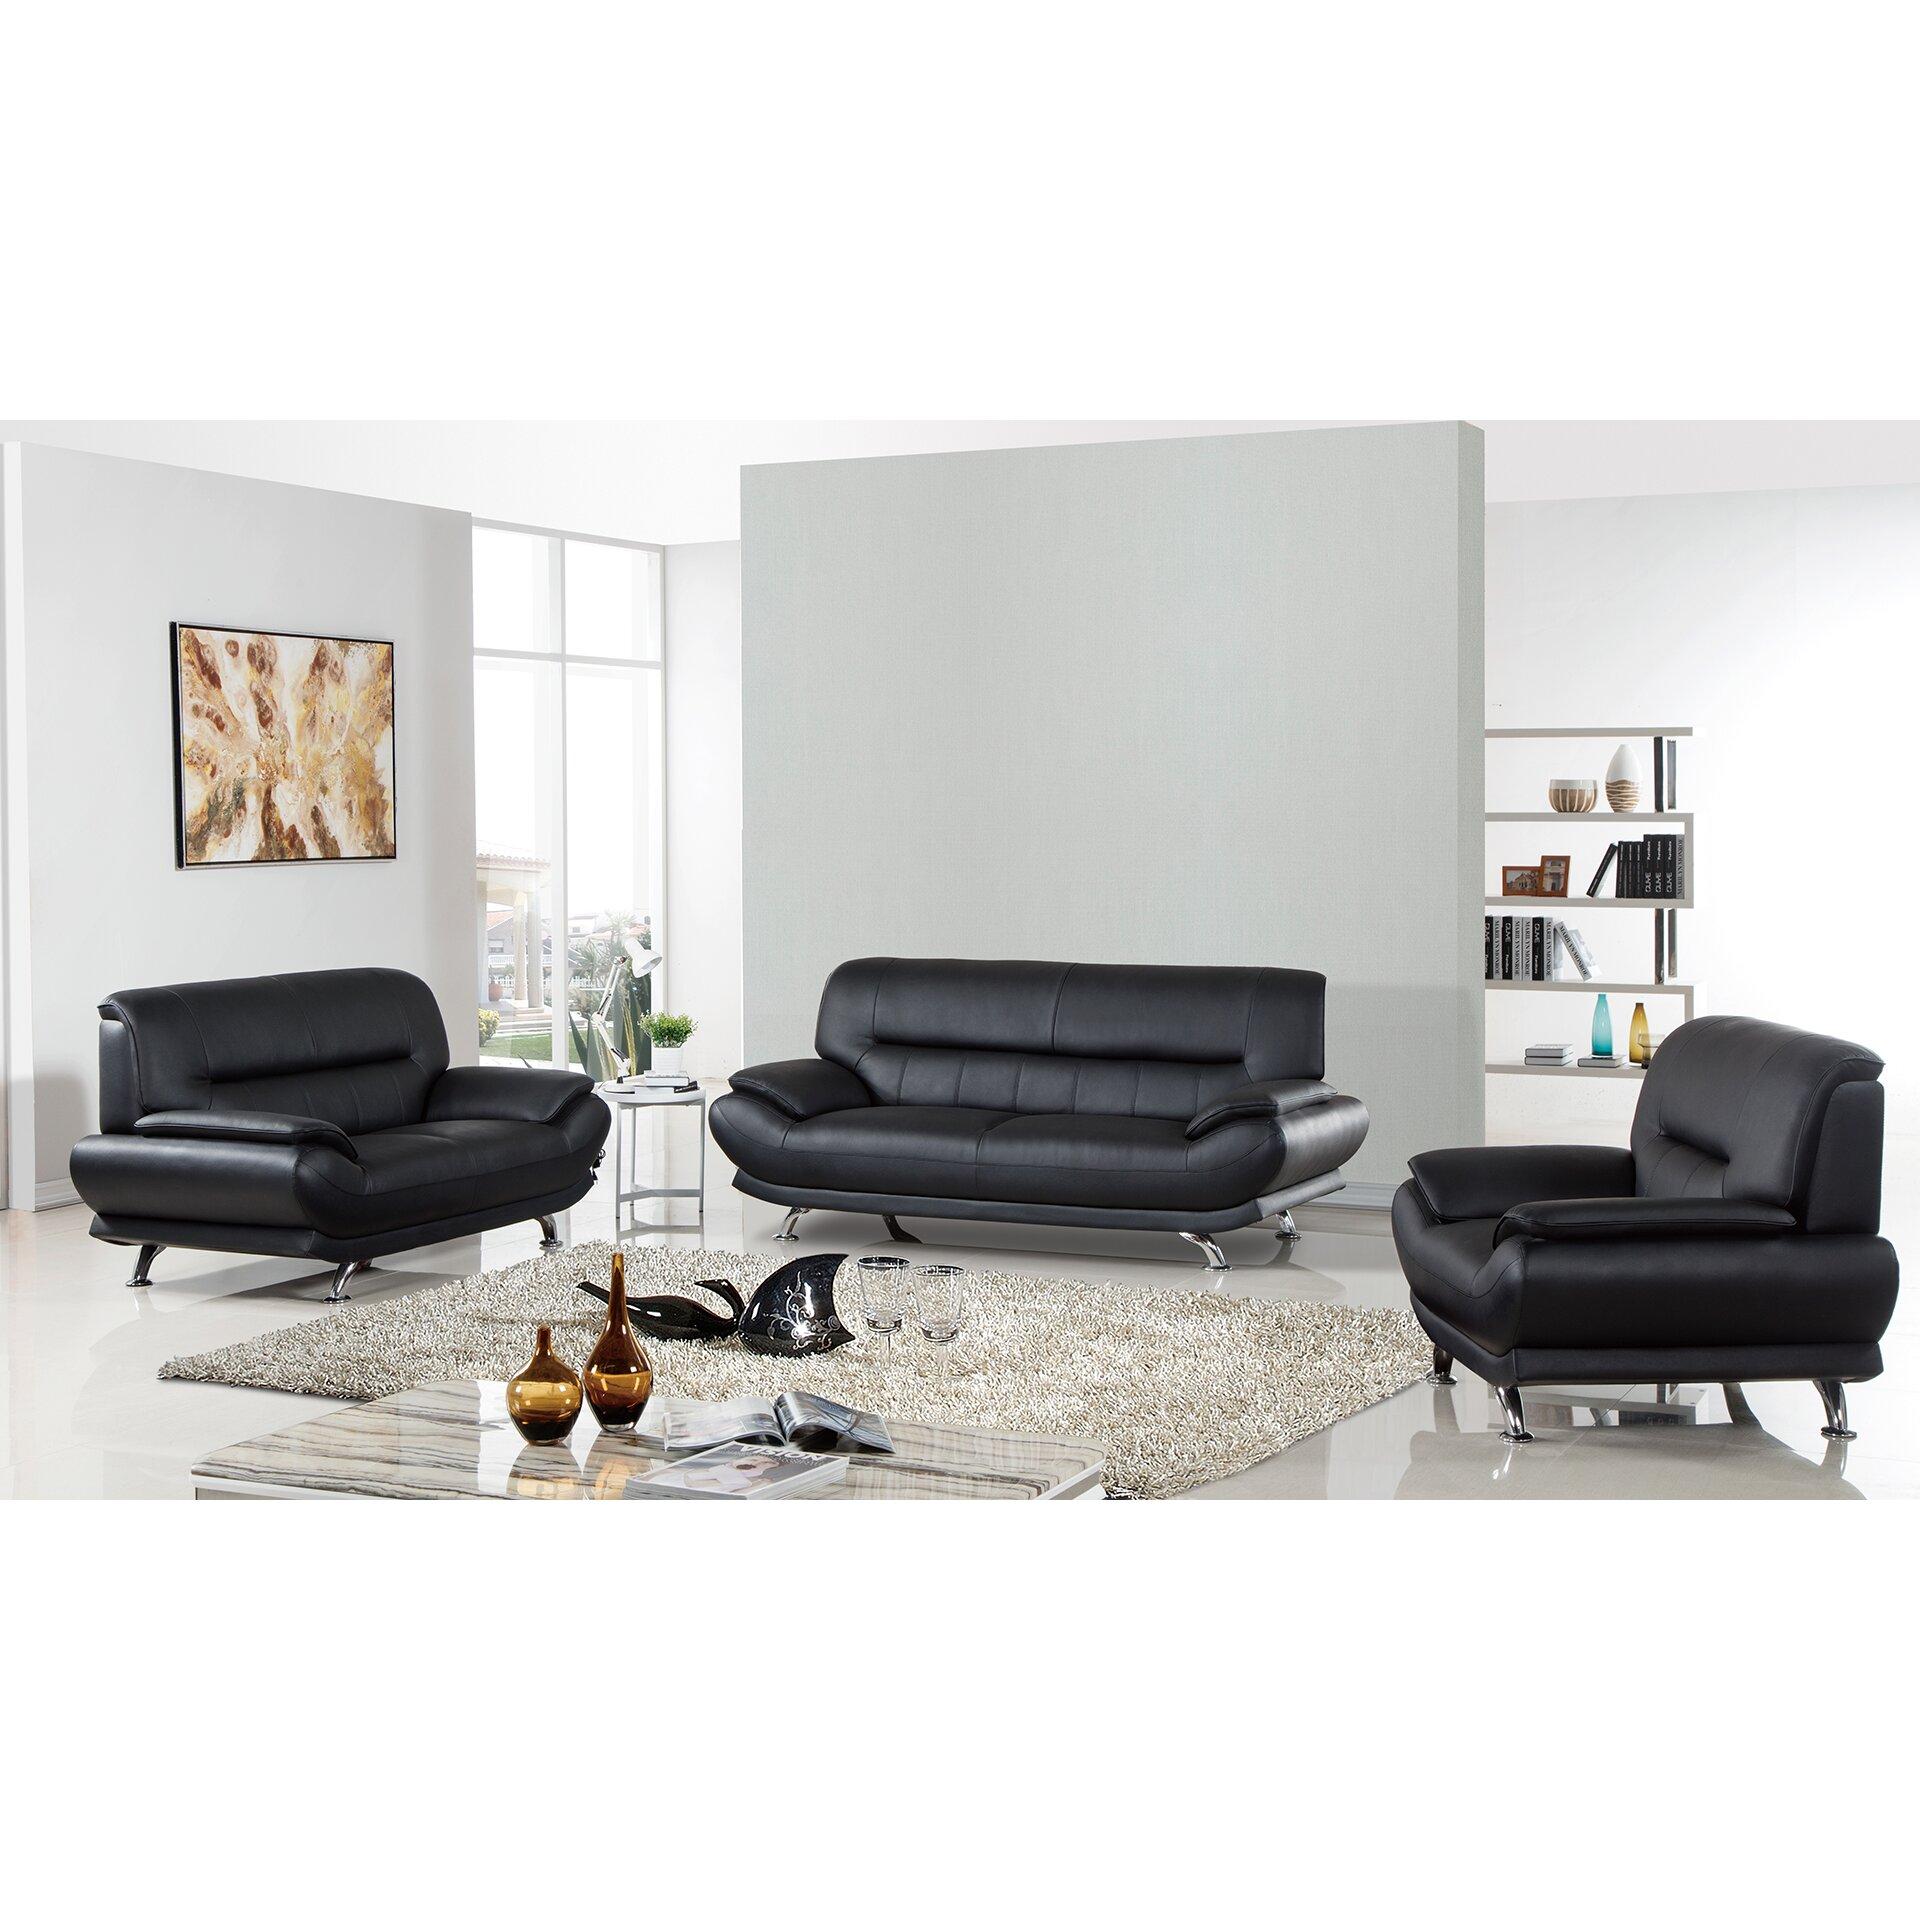 americaneagleinternationaltrading arcadia 3 piece leather living room set reviews wayfair. Black Bedroom Furniture Sets. Home Design Ideas